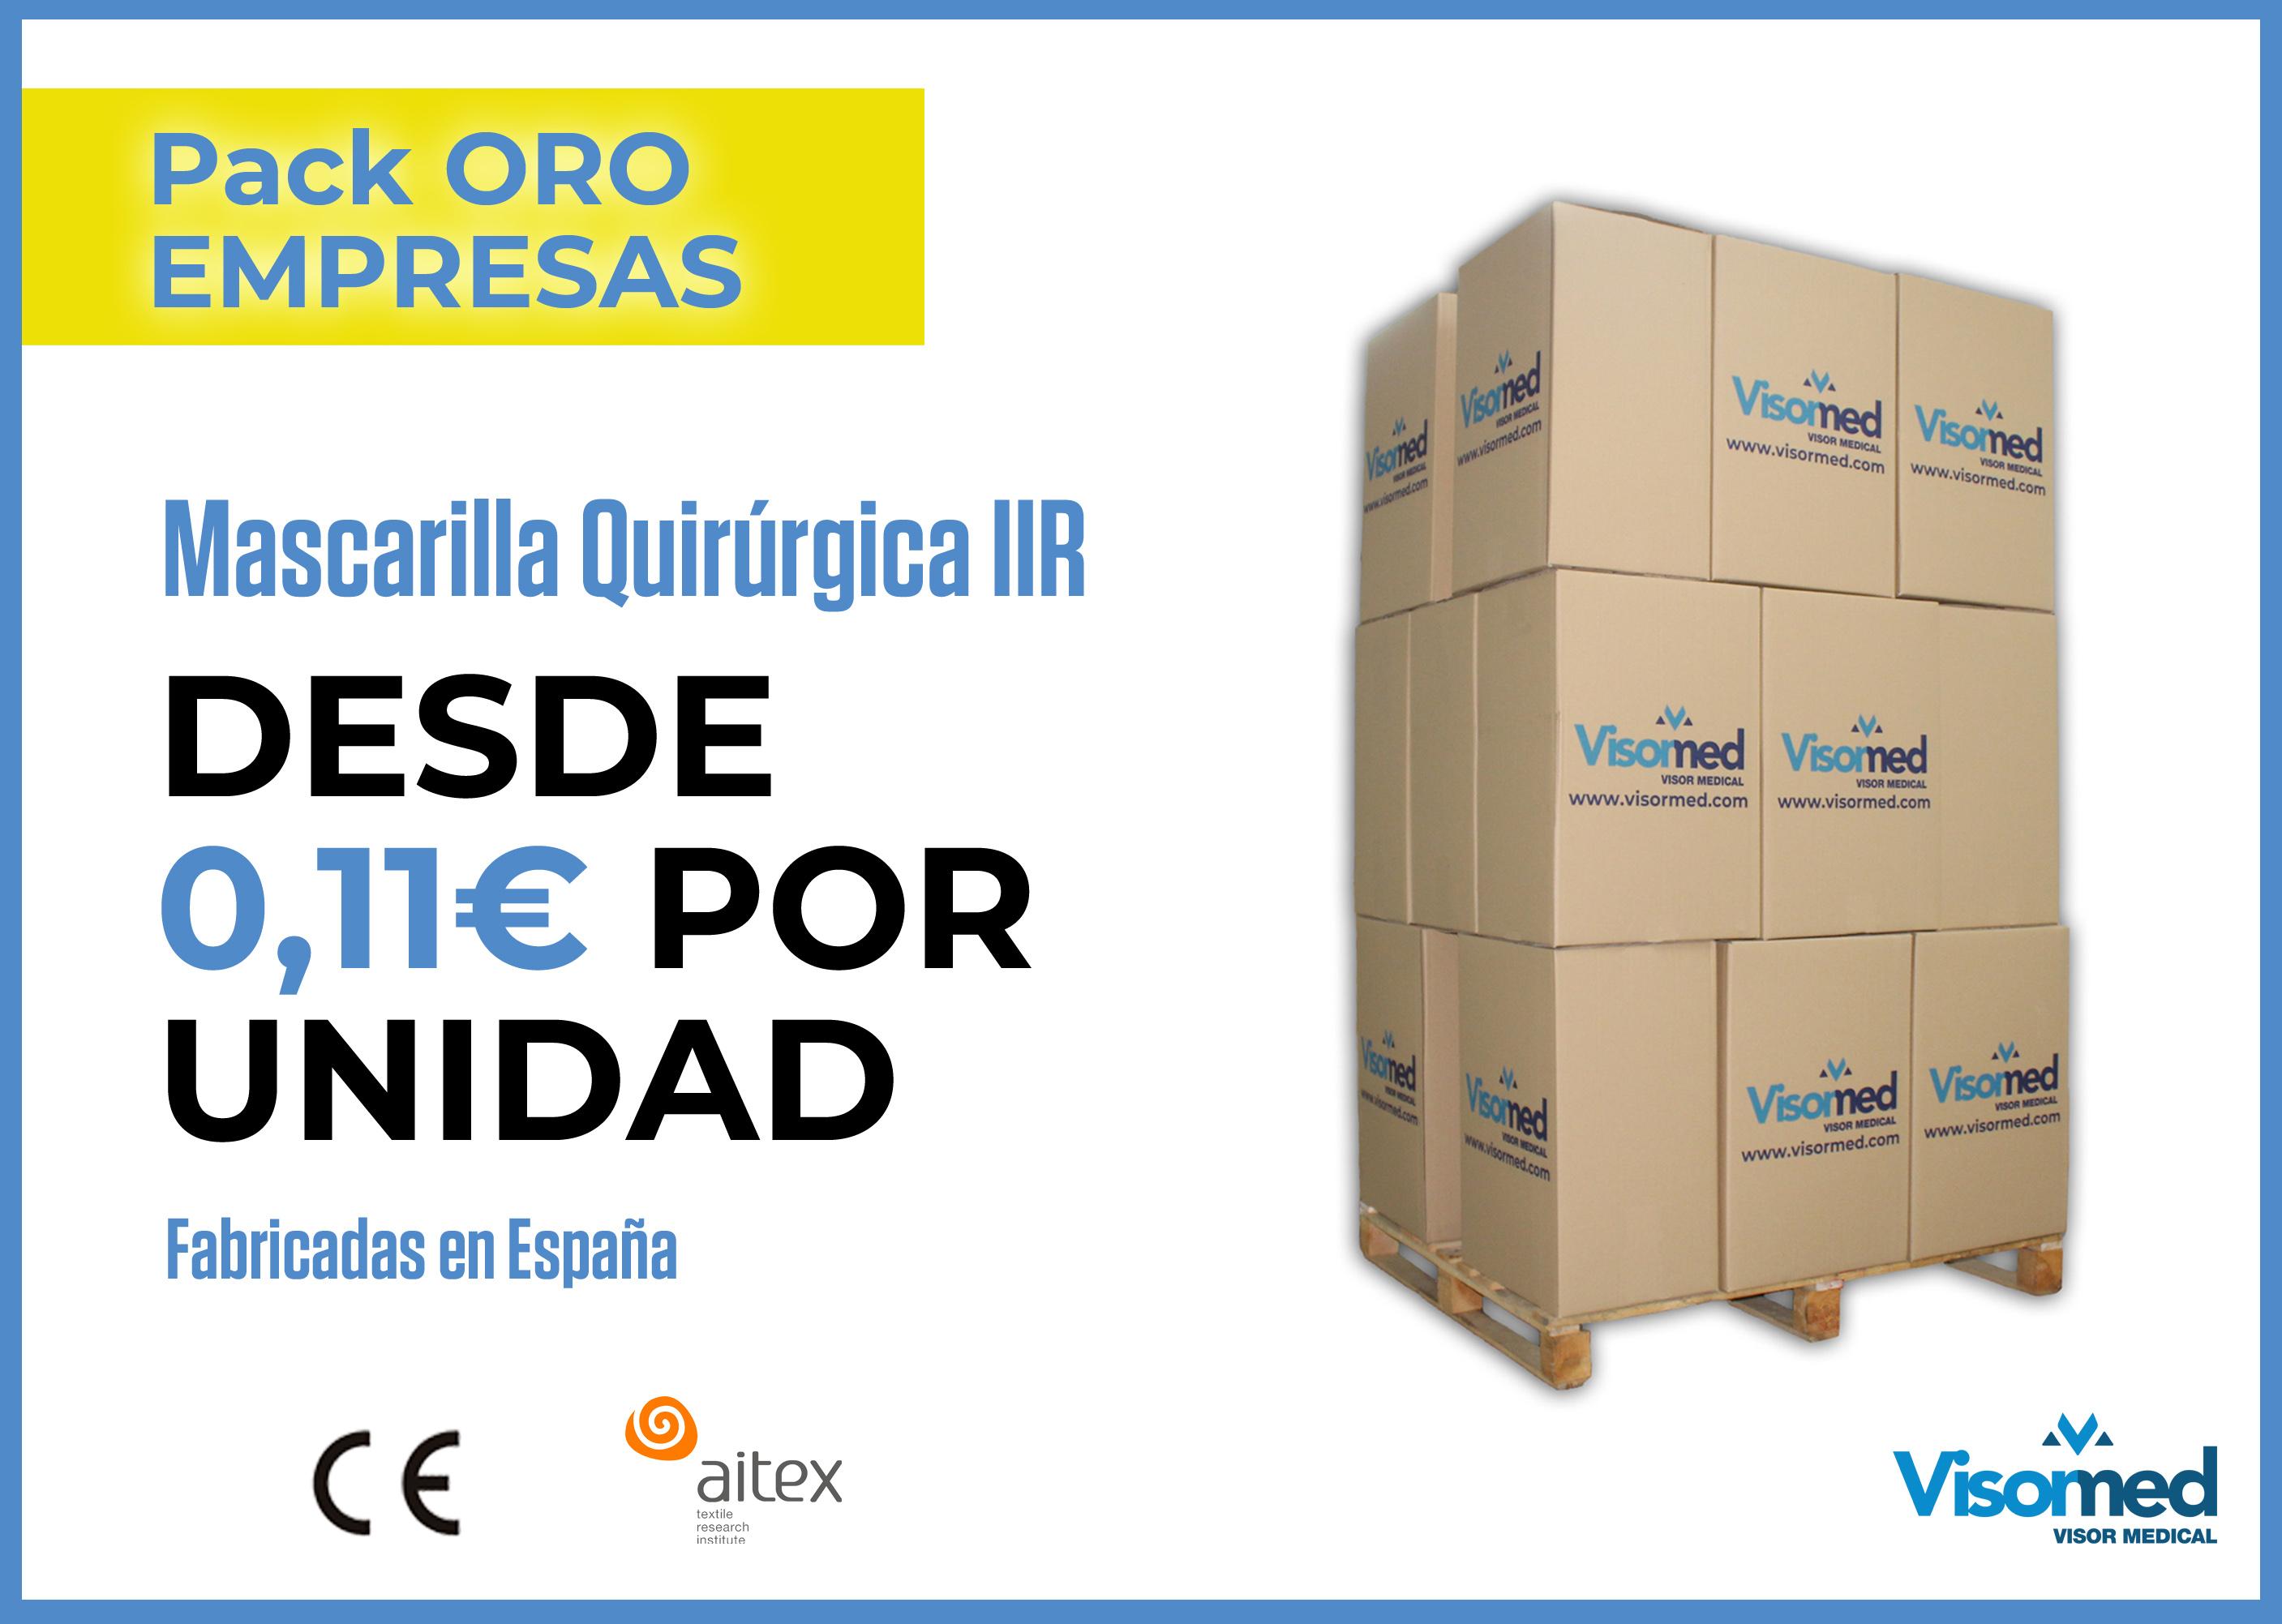 Packs 'Oro' Empresas - Mascarillas Quirúrgicas IIR - 1.800 uds.